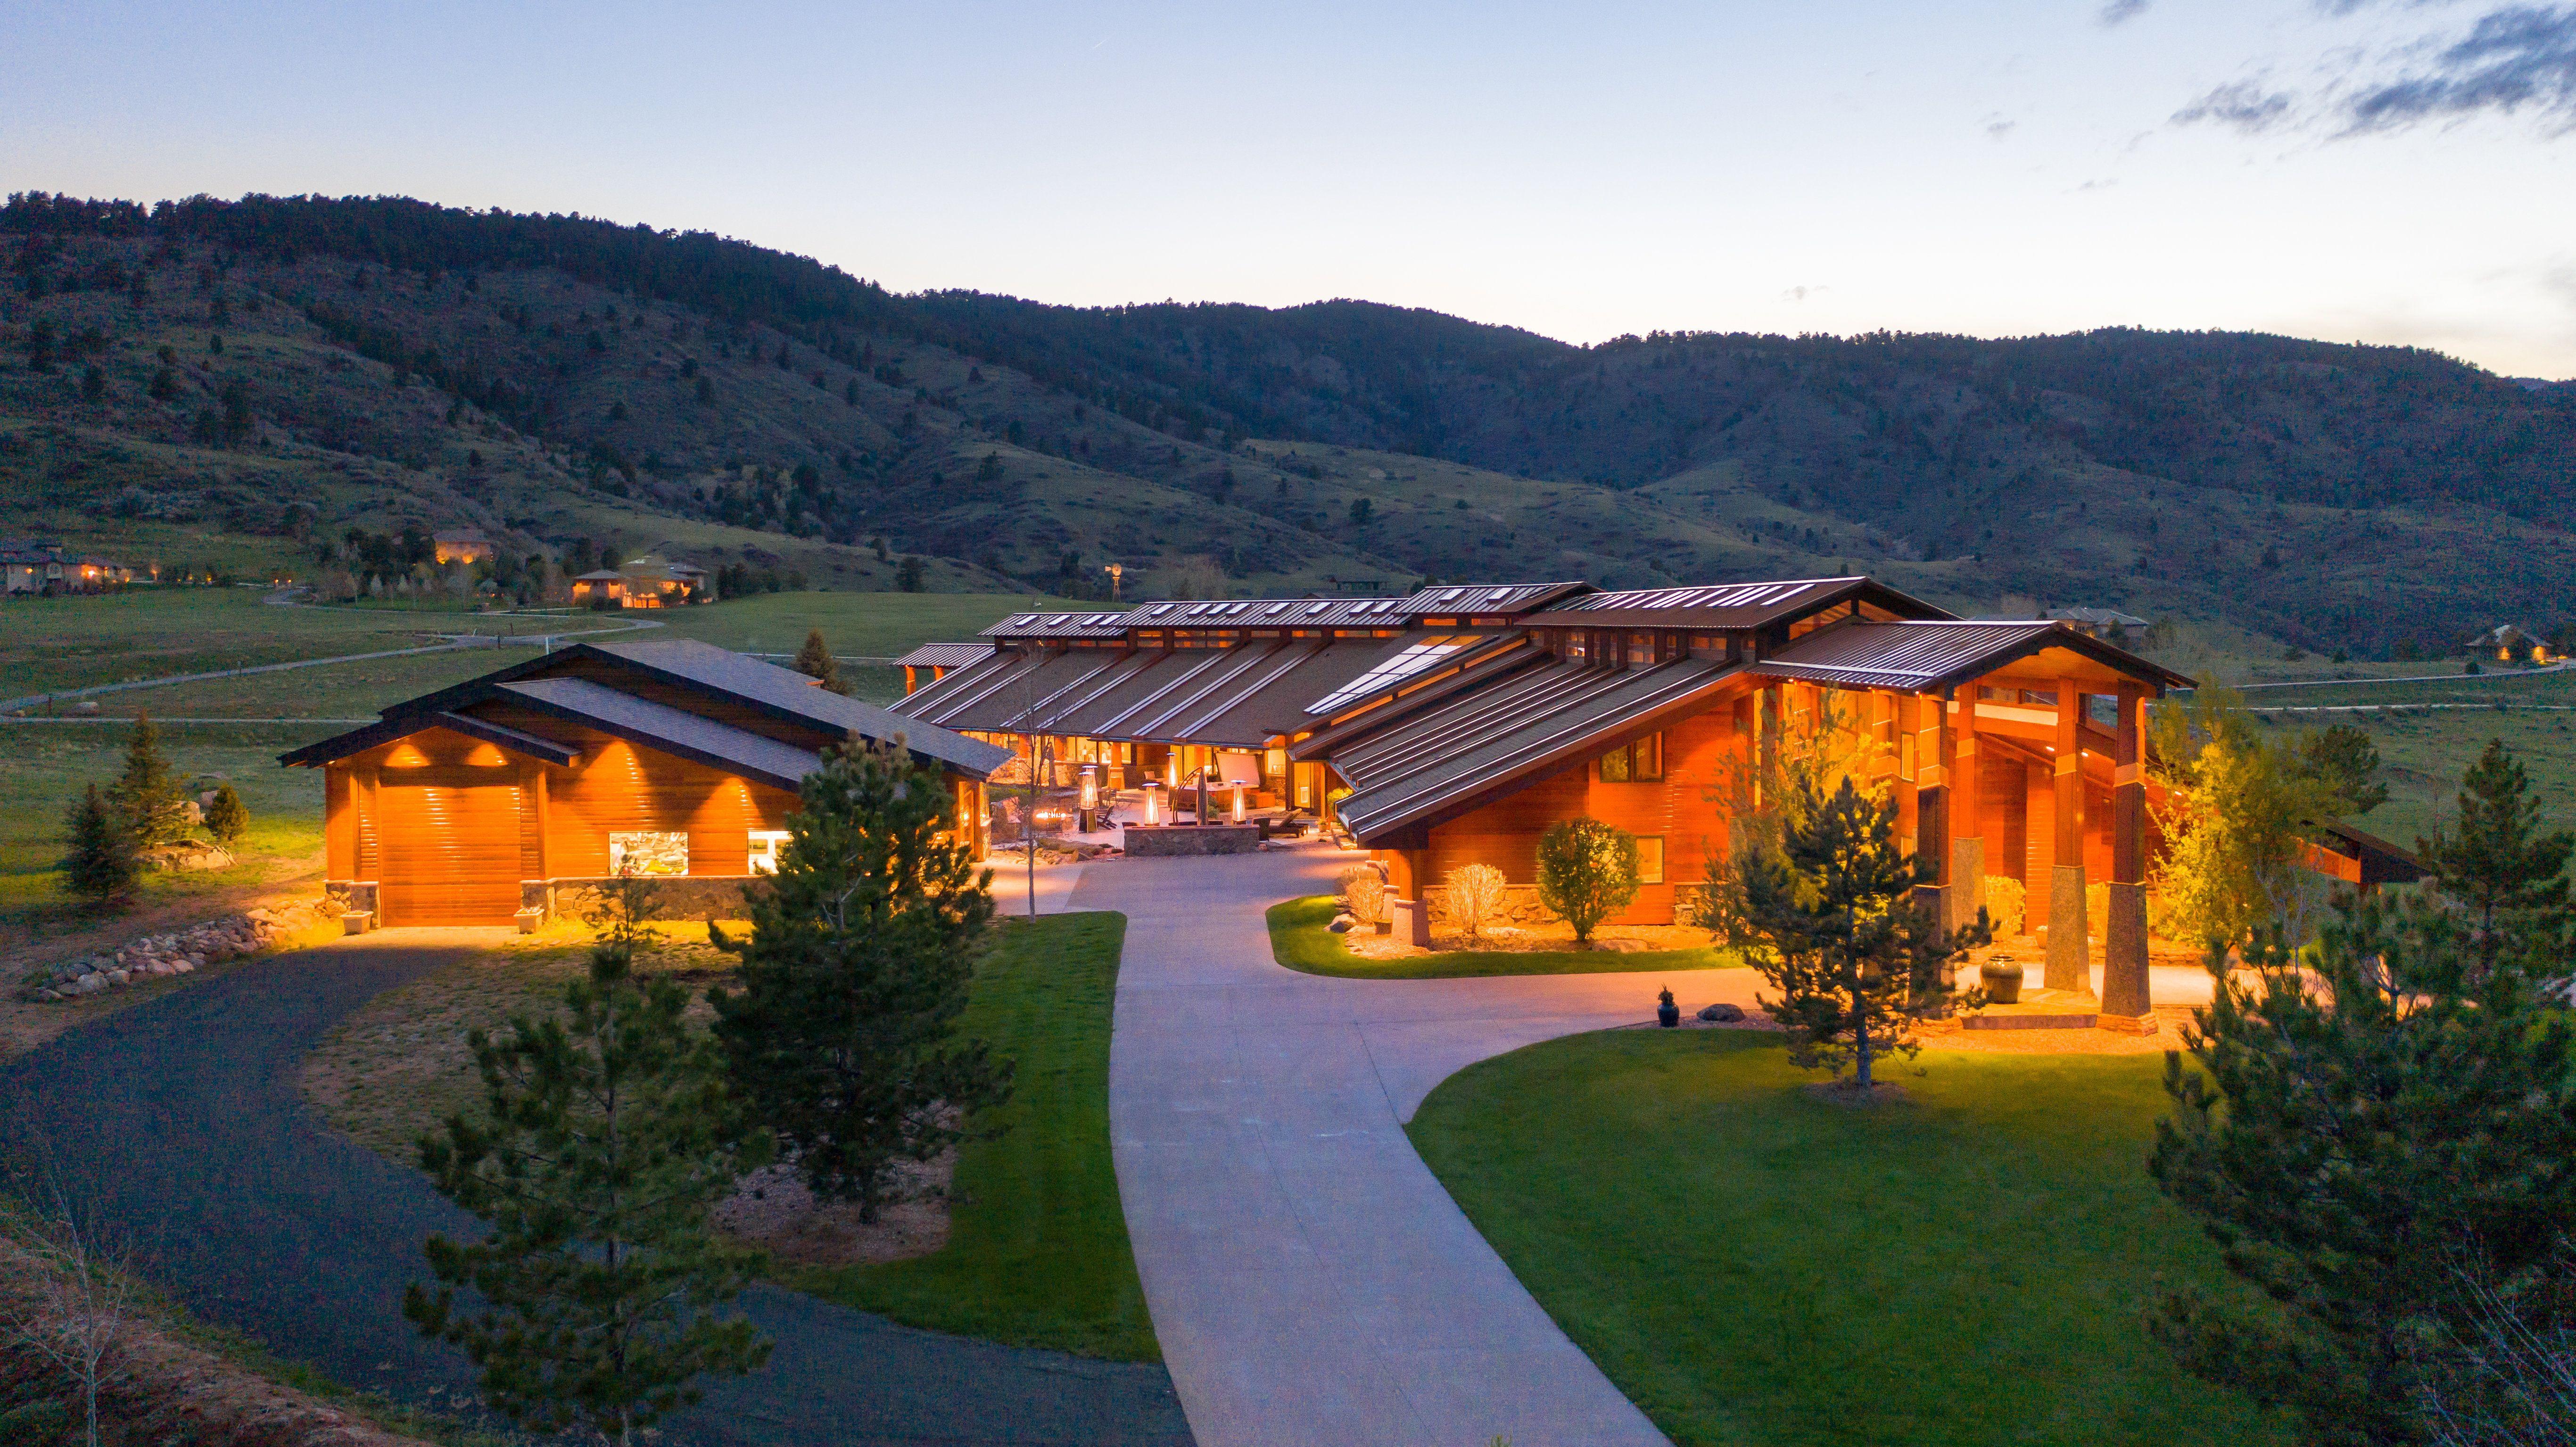 Colorado Mountain house on 35 acres asks $7M evening view